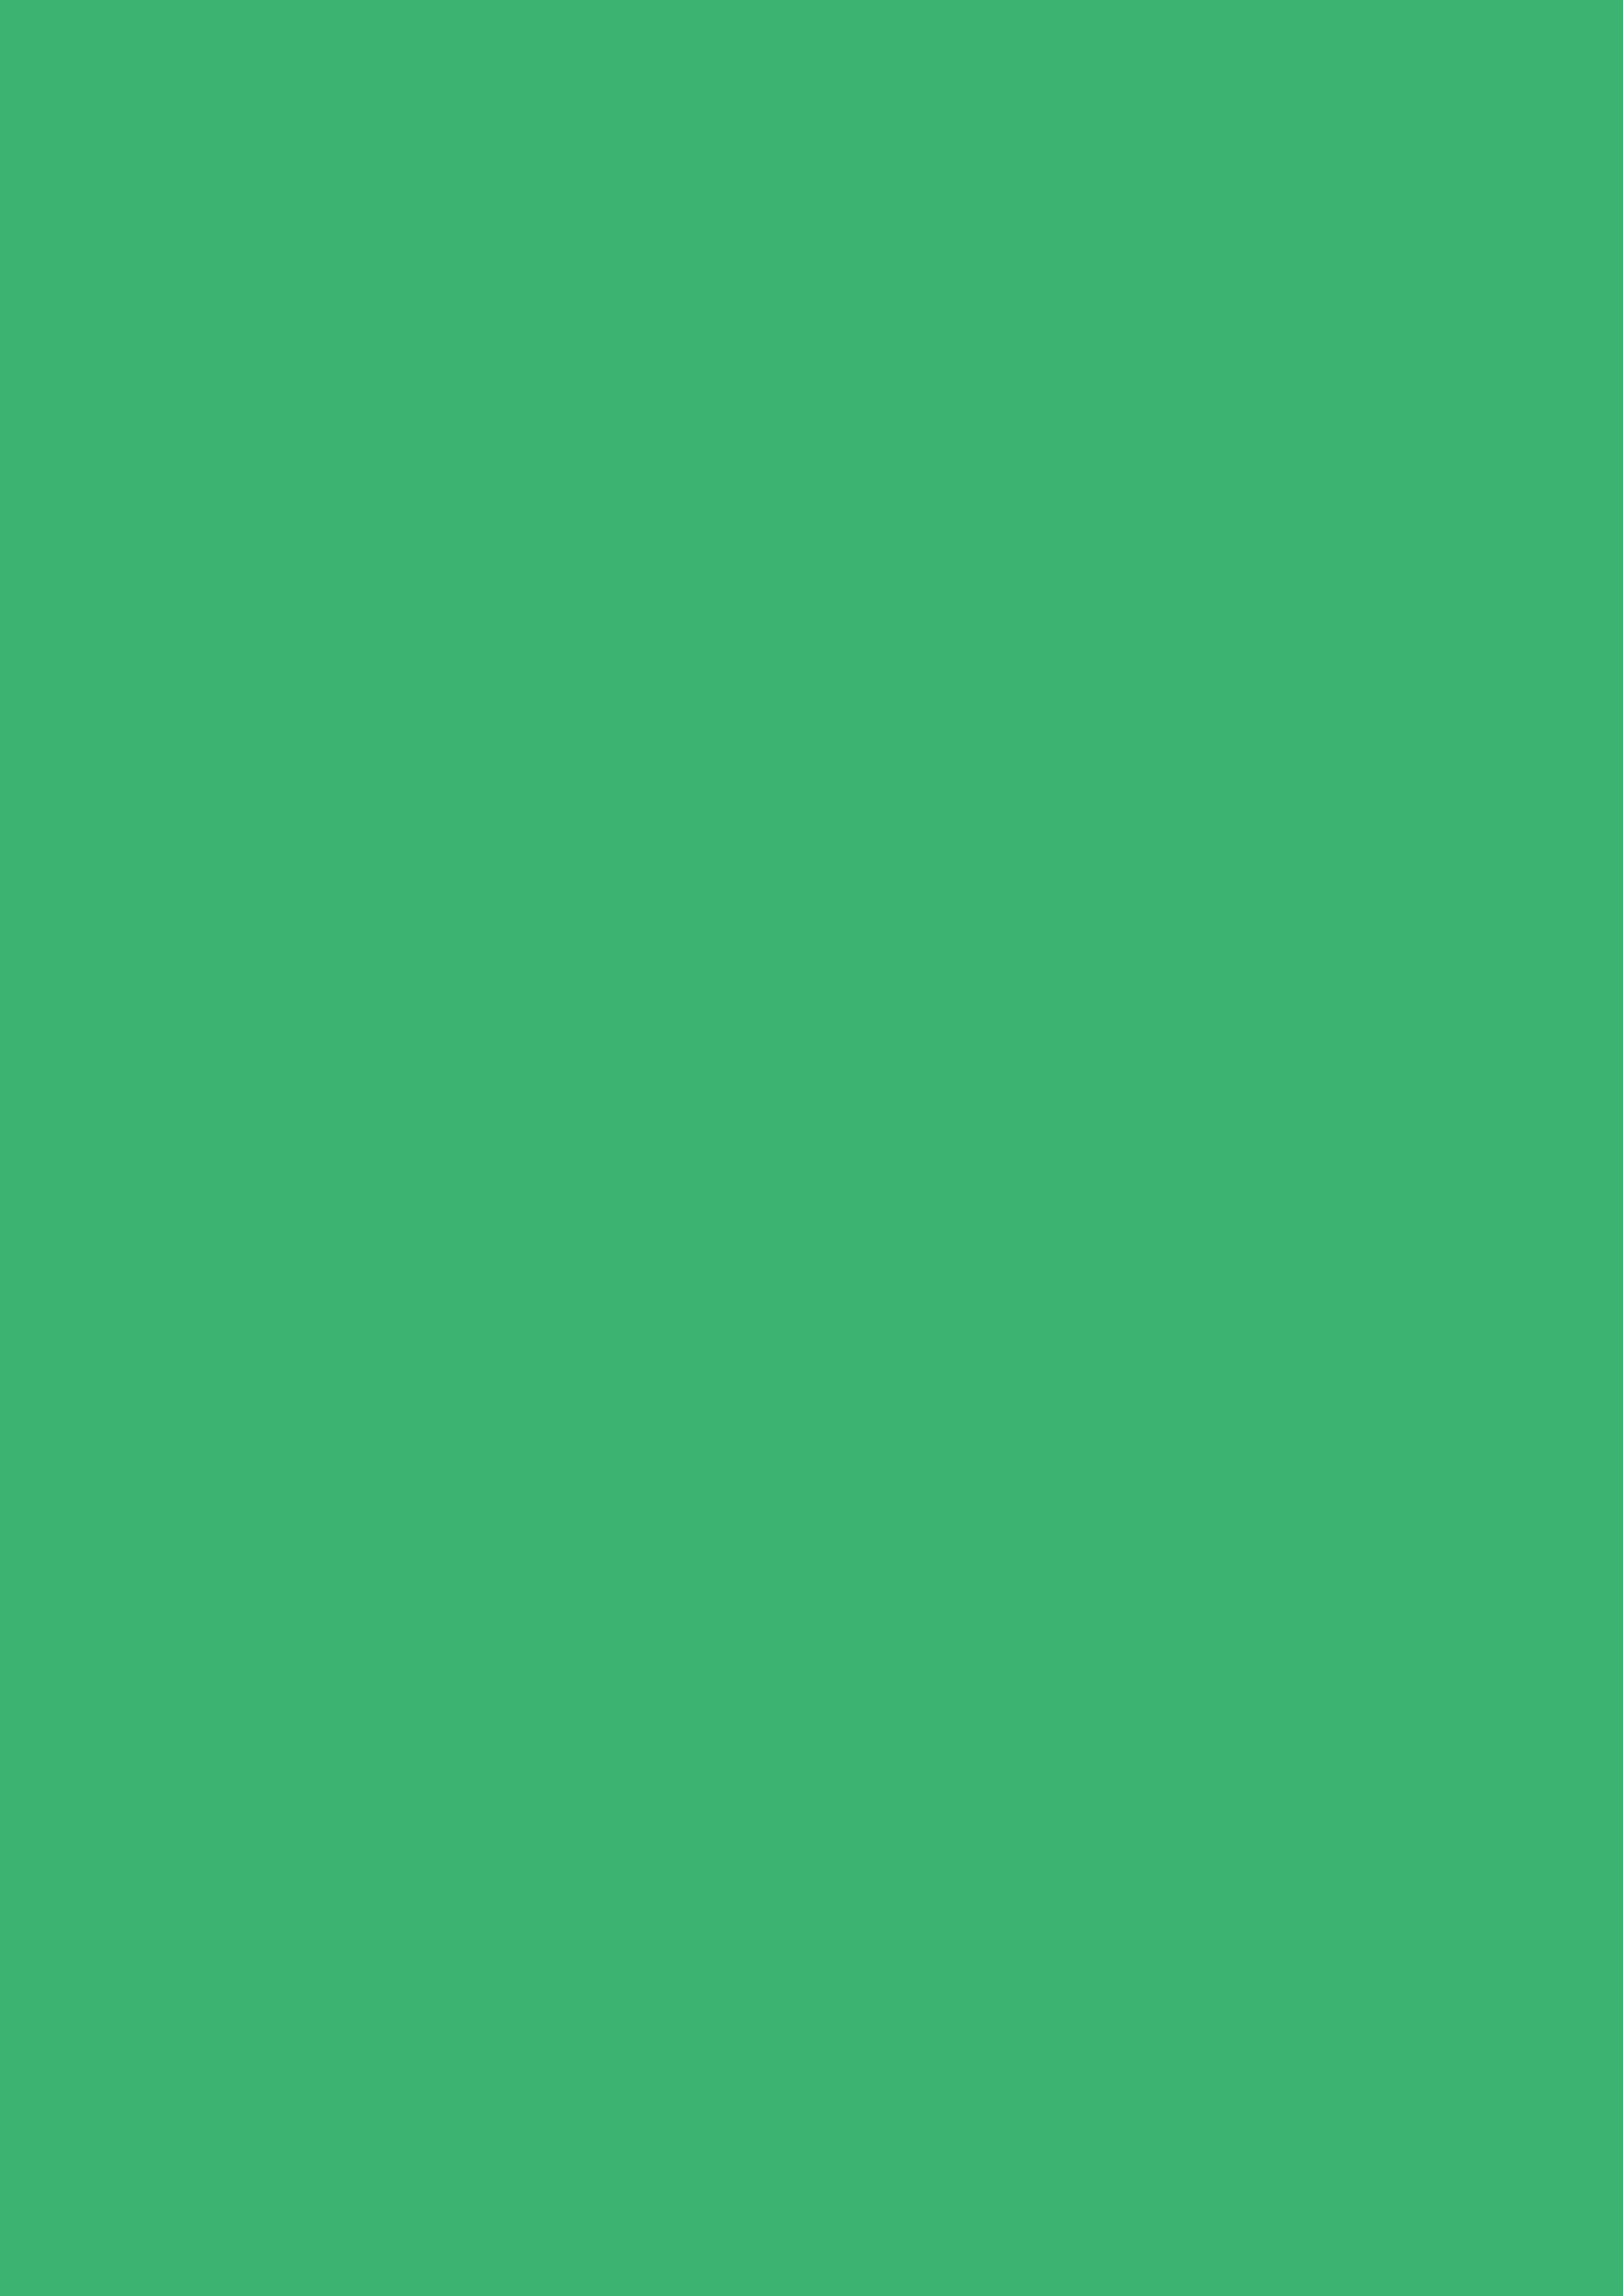 2480x3508 Medium Sea Green Solid Color Background